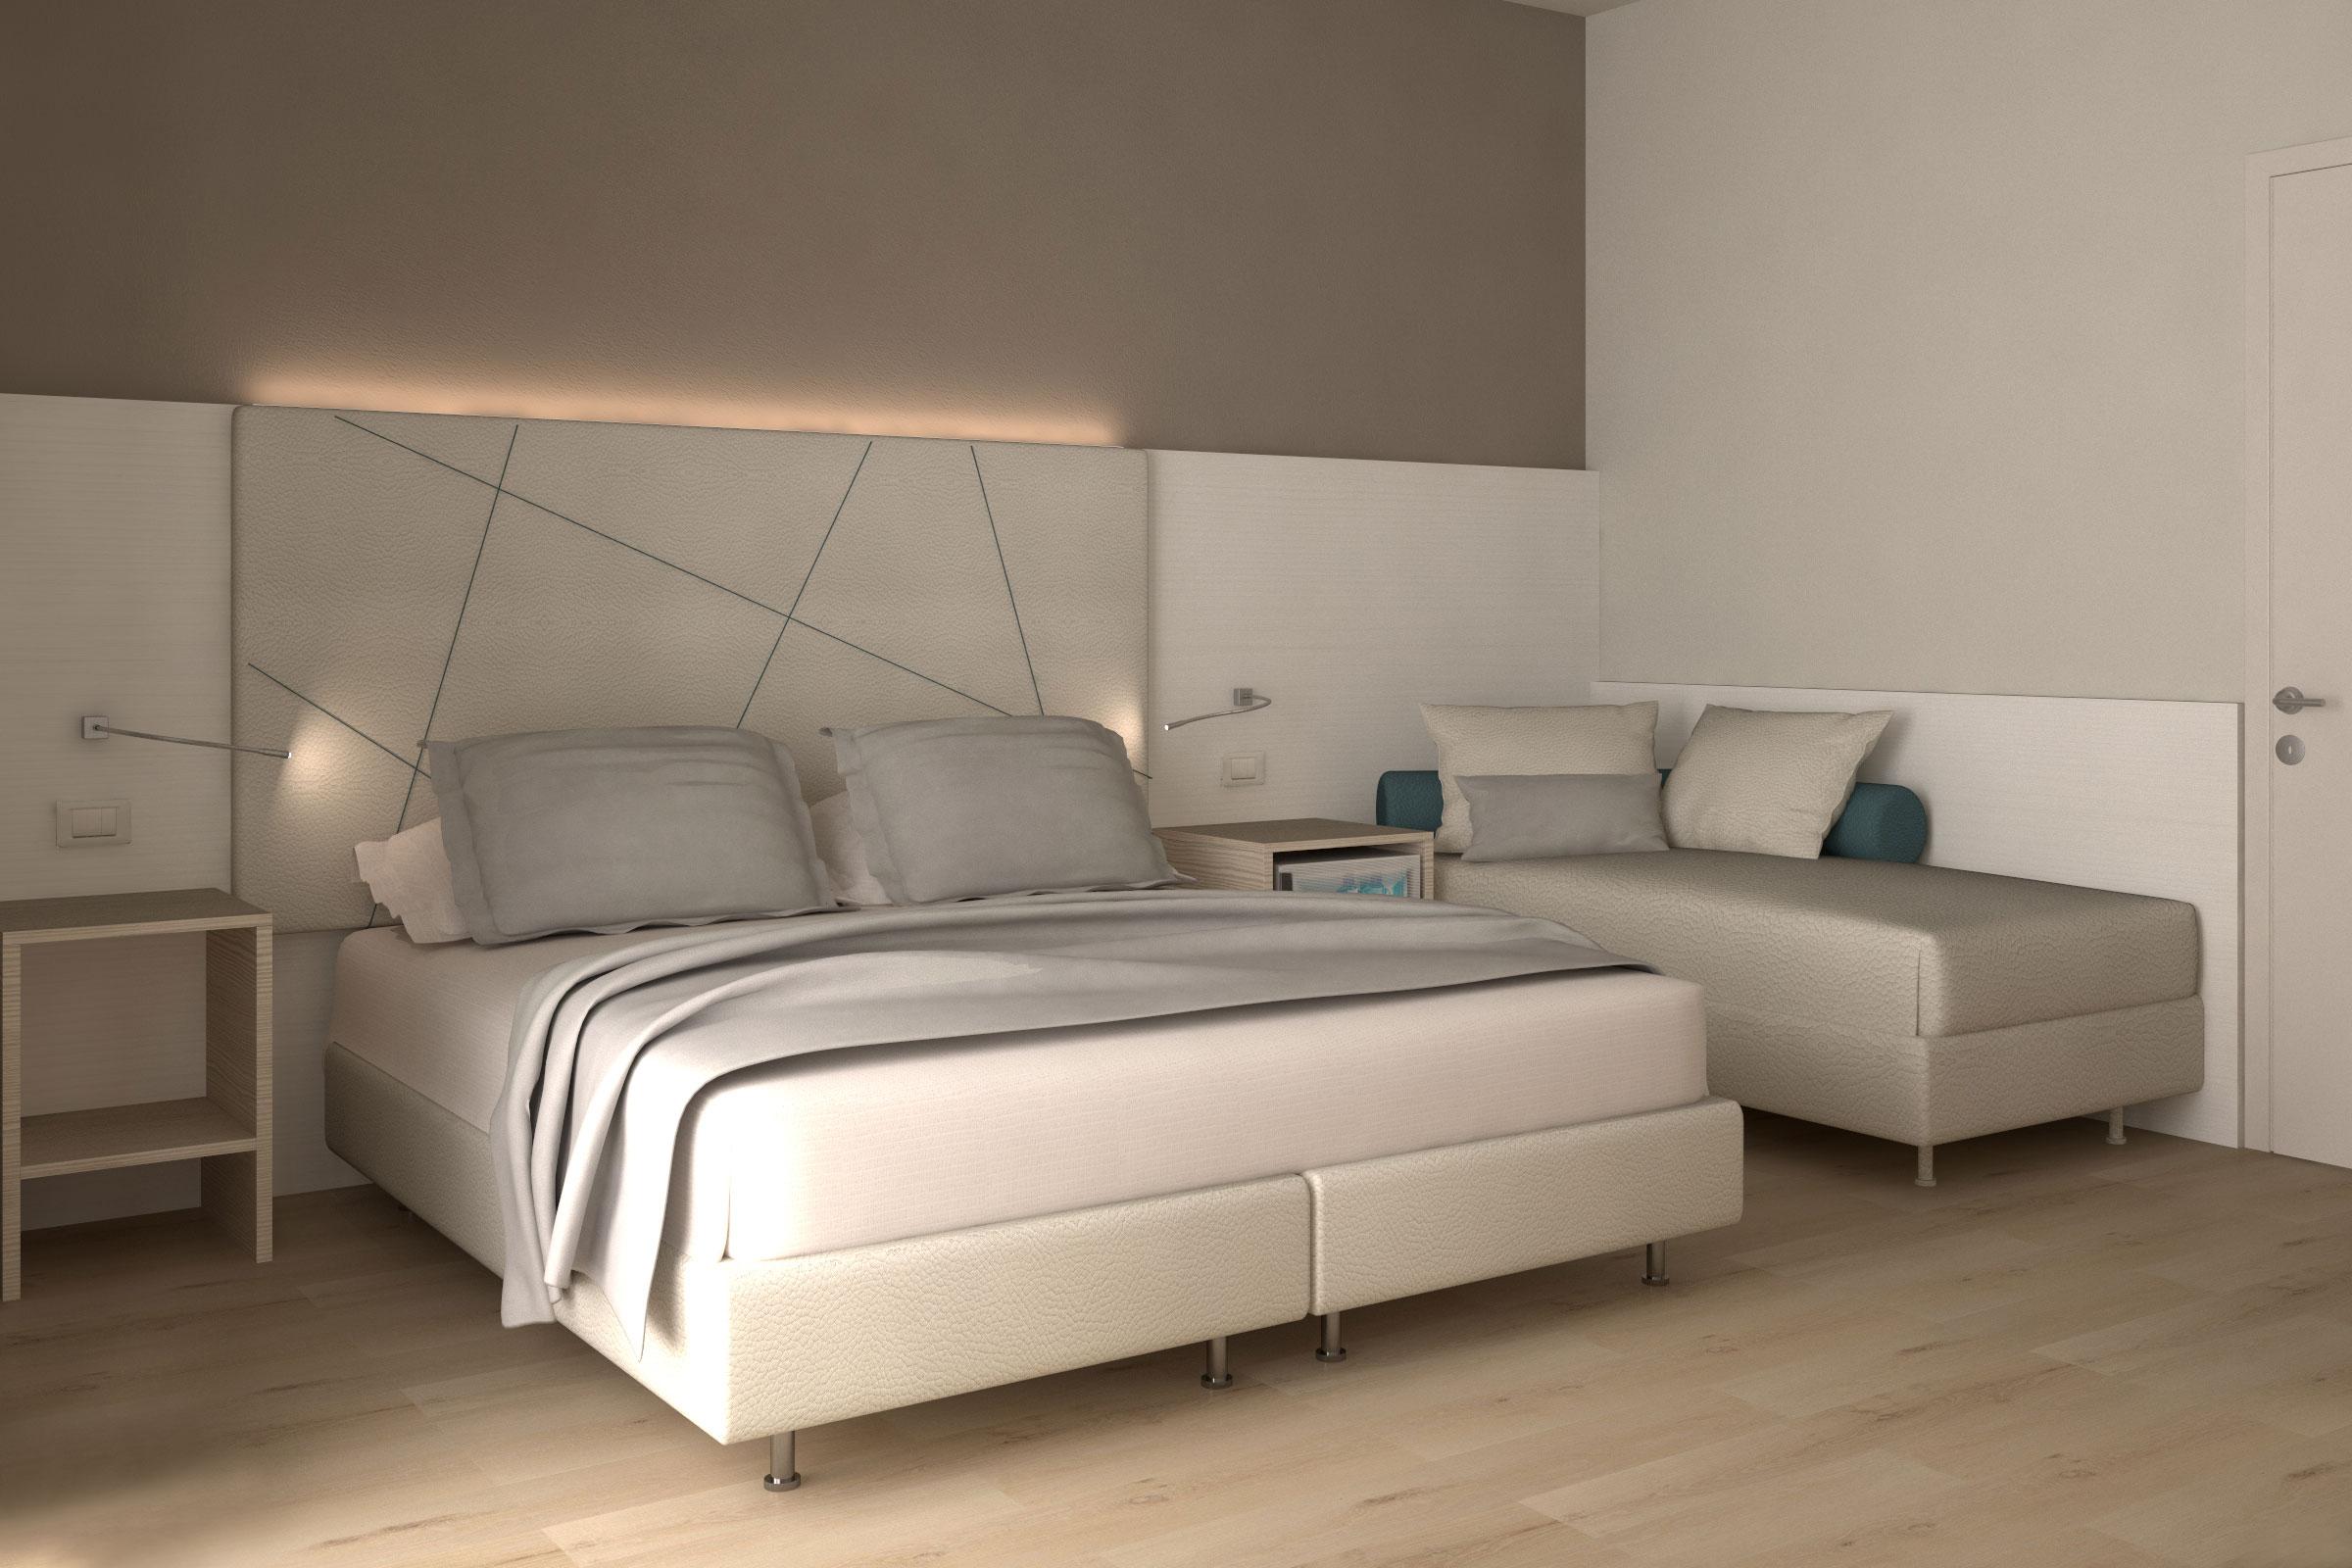 arredo-hotel-moderno-ambassador-caorle-1